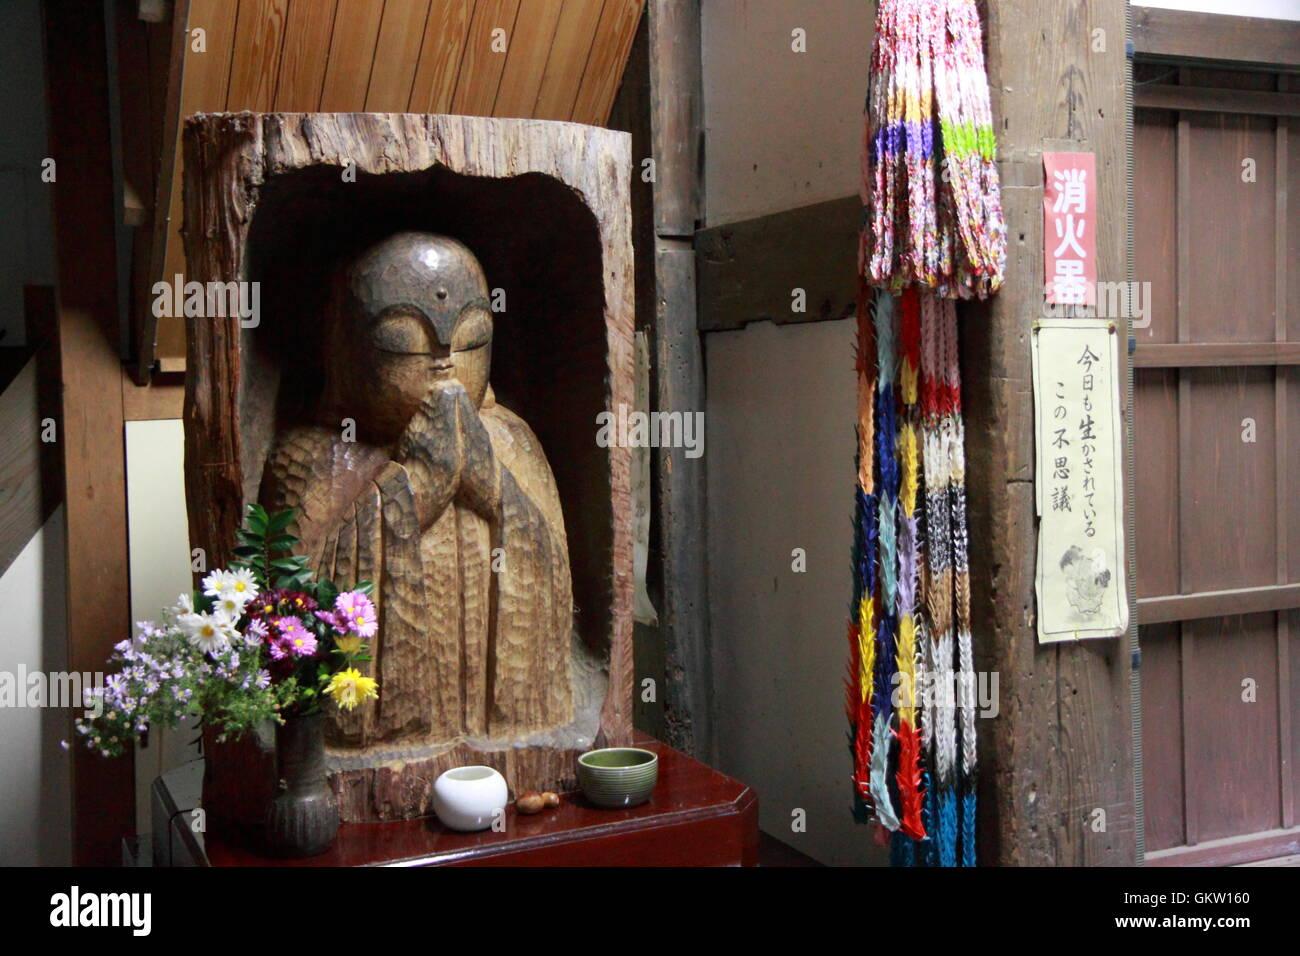 Japanische Buddaha Statur und Origami Kraniche am Daijoji Tempel Kanazawa Japan Stockbild